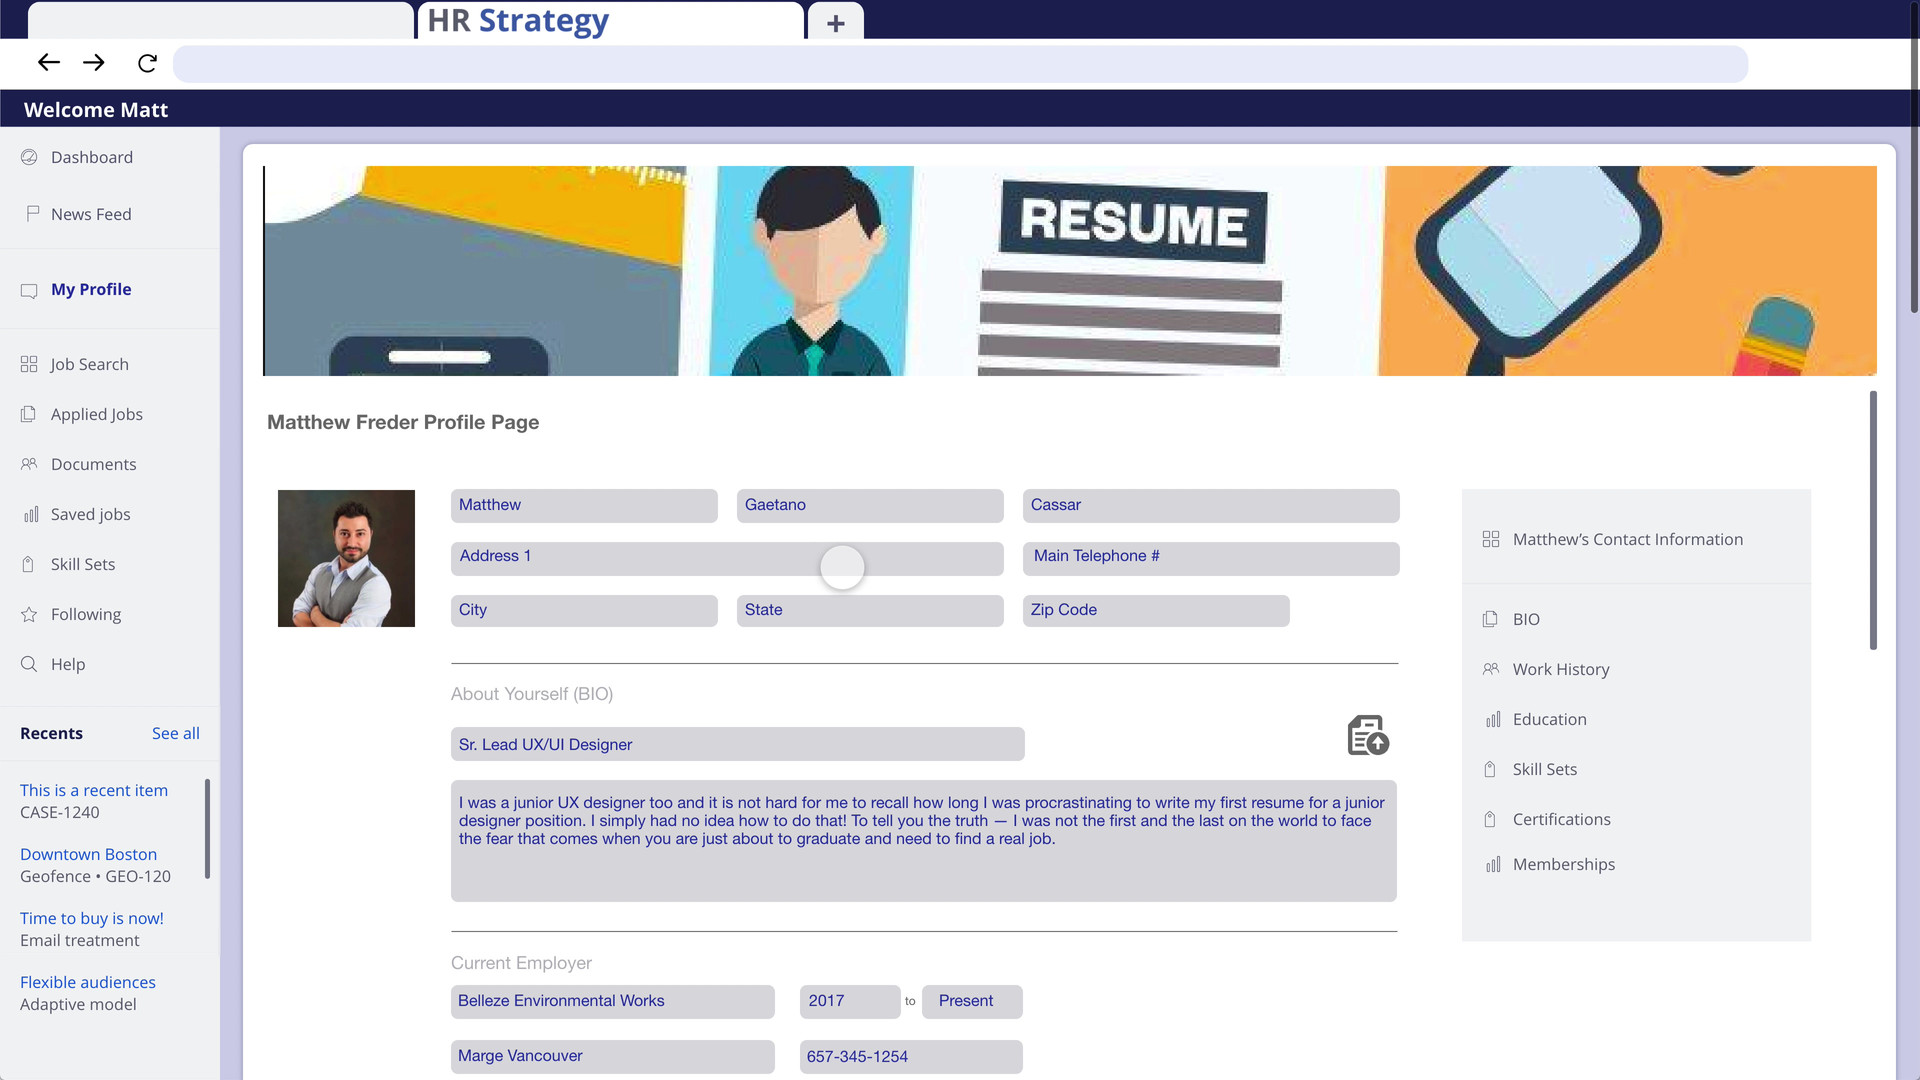 Create User Profile - HR Strategy.mp4